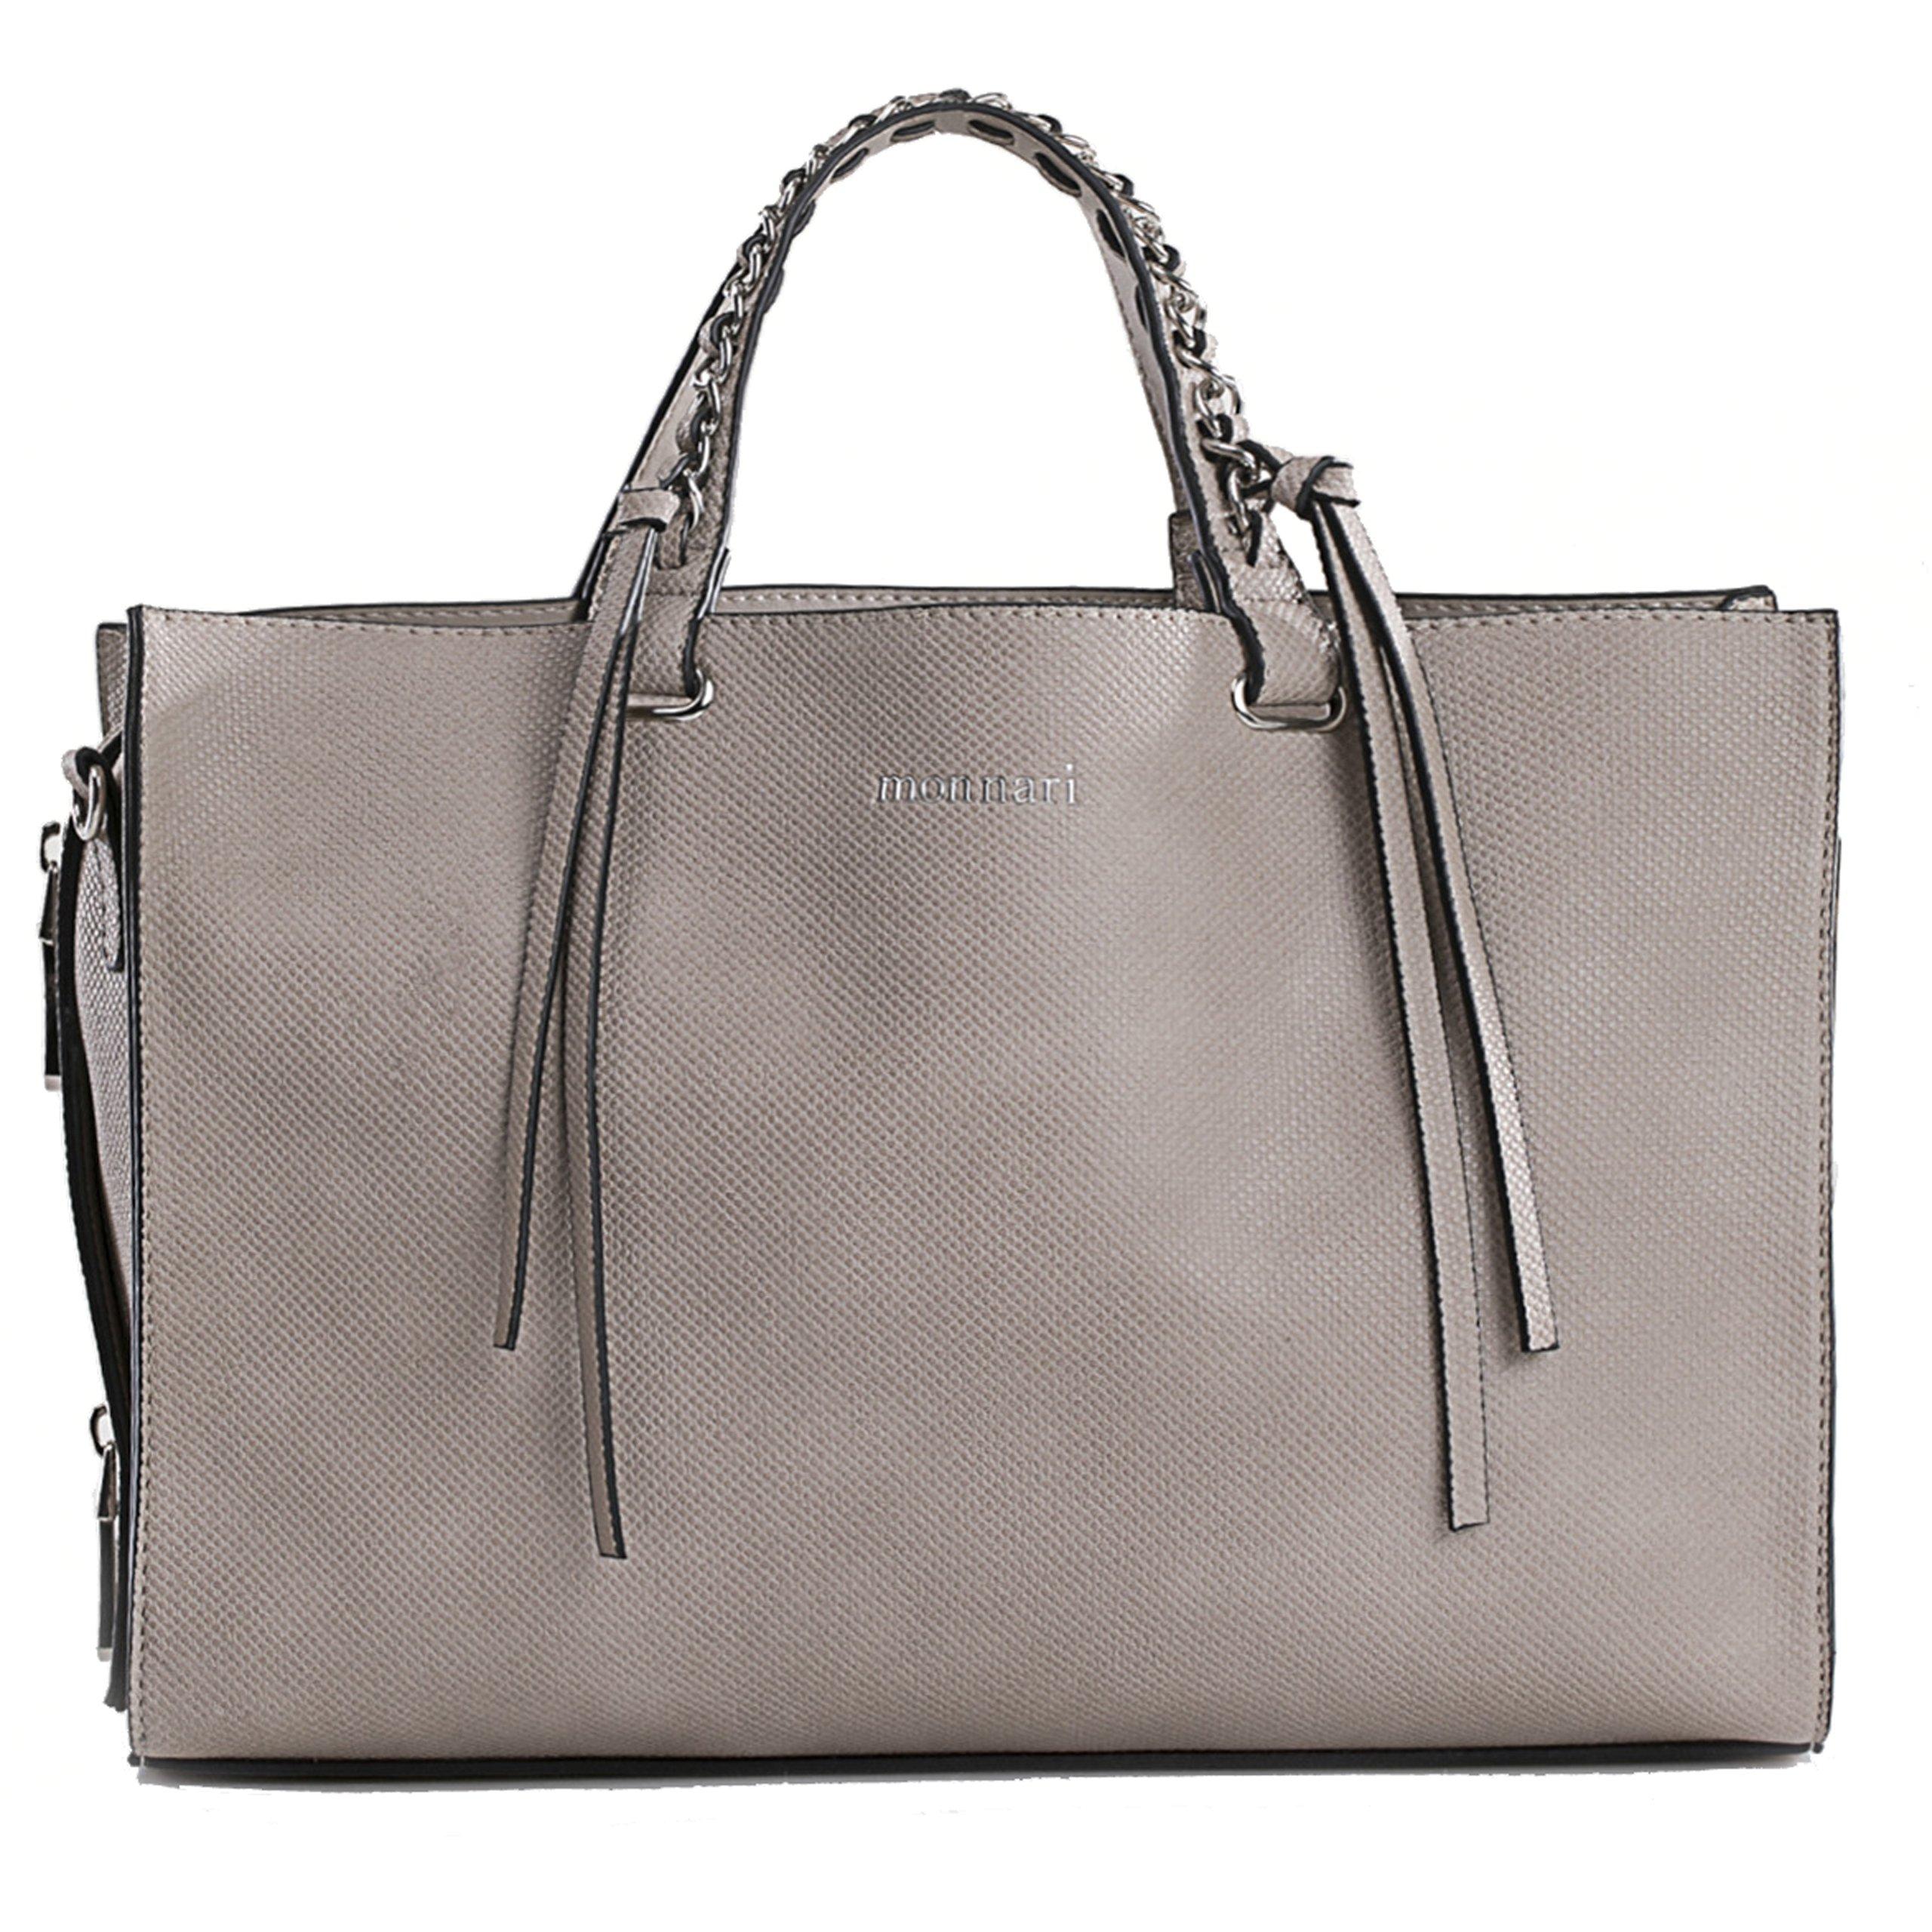 f2ec6e9e50fe1 Torebka Monnari Handbag 7350 Promocja - 7262444405 - oficjalne ...